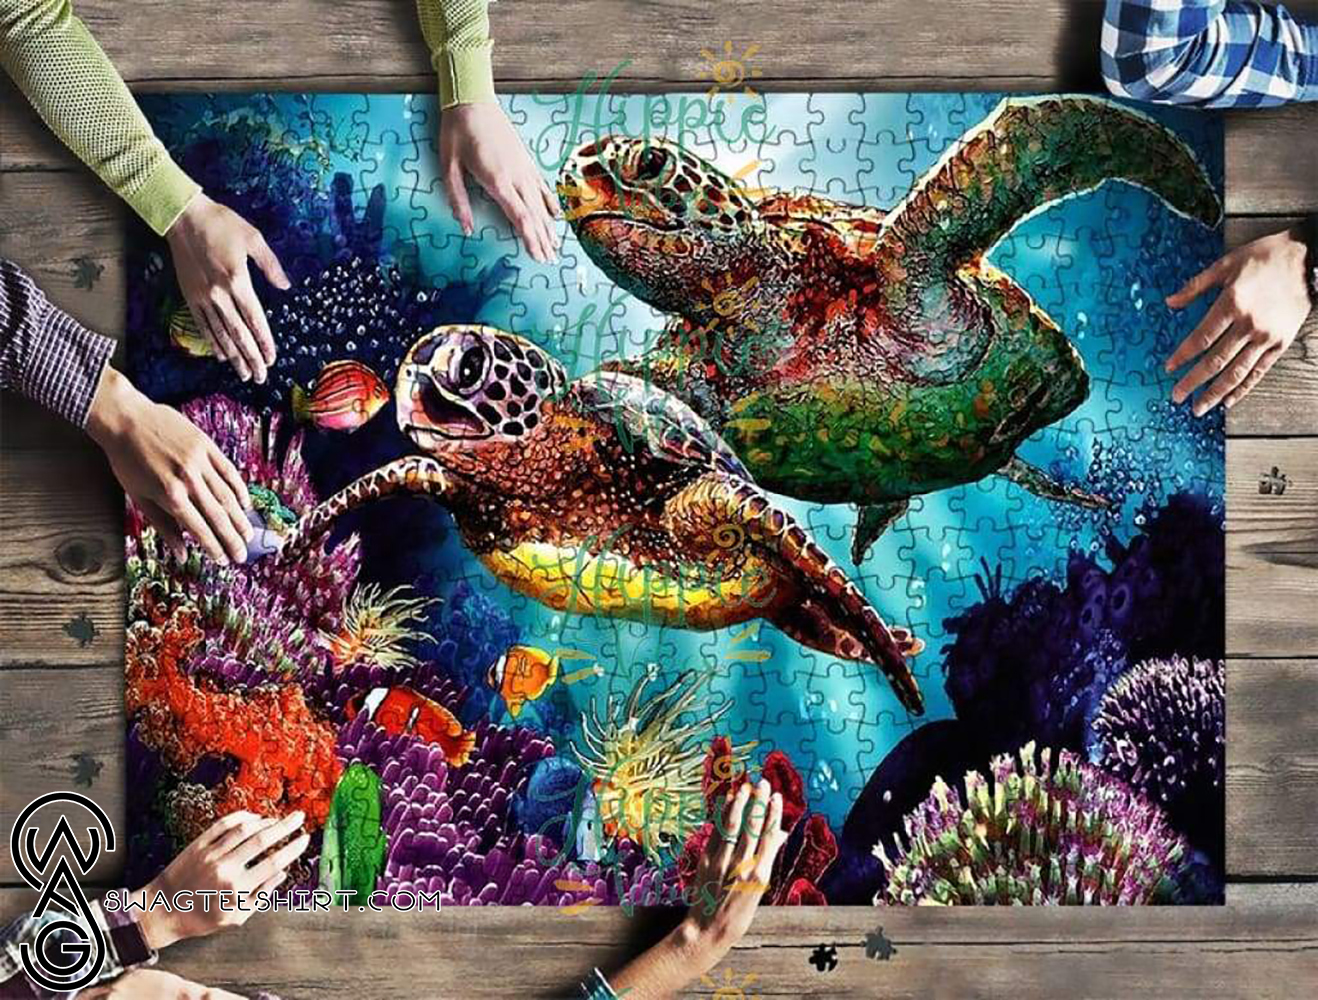 Save sea turtles jigsaw puzzle - maria